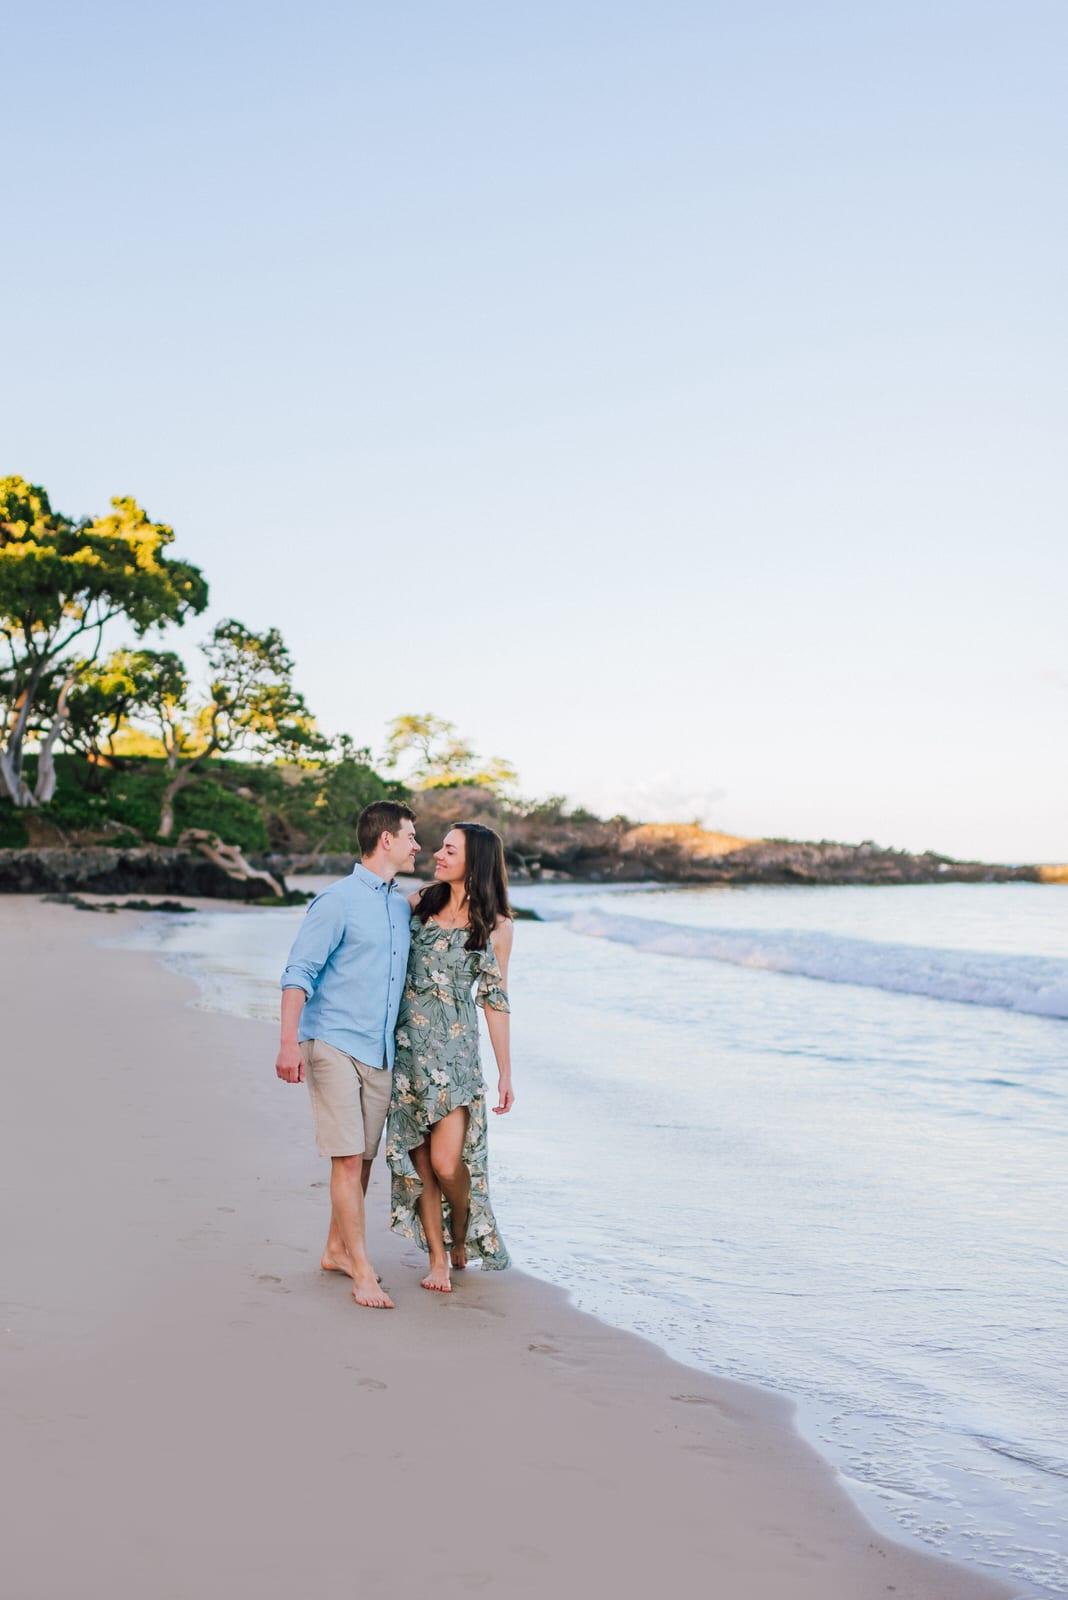 Hawaii-Family-Photographers-Mauna-Kea-Sunset-Waikoloa-11.jpg